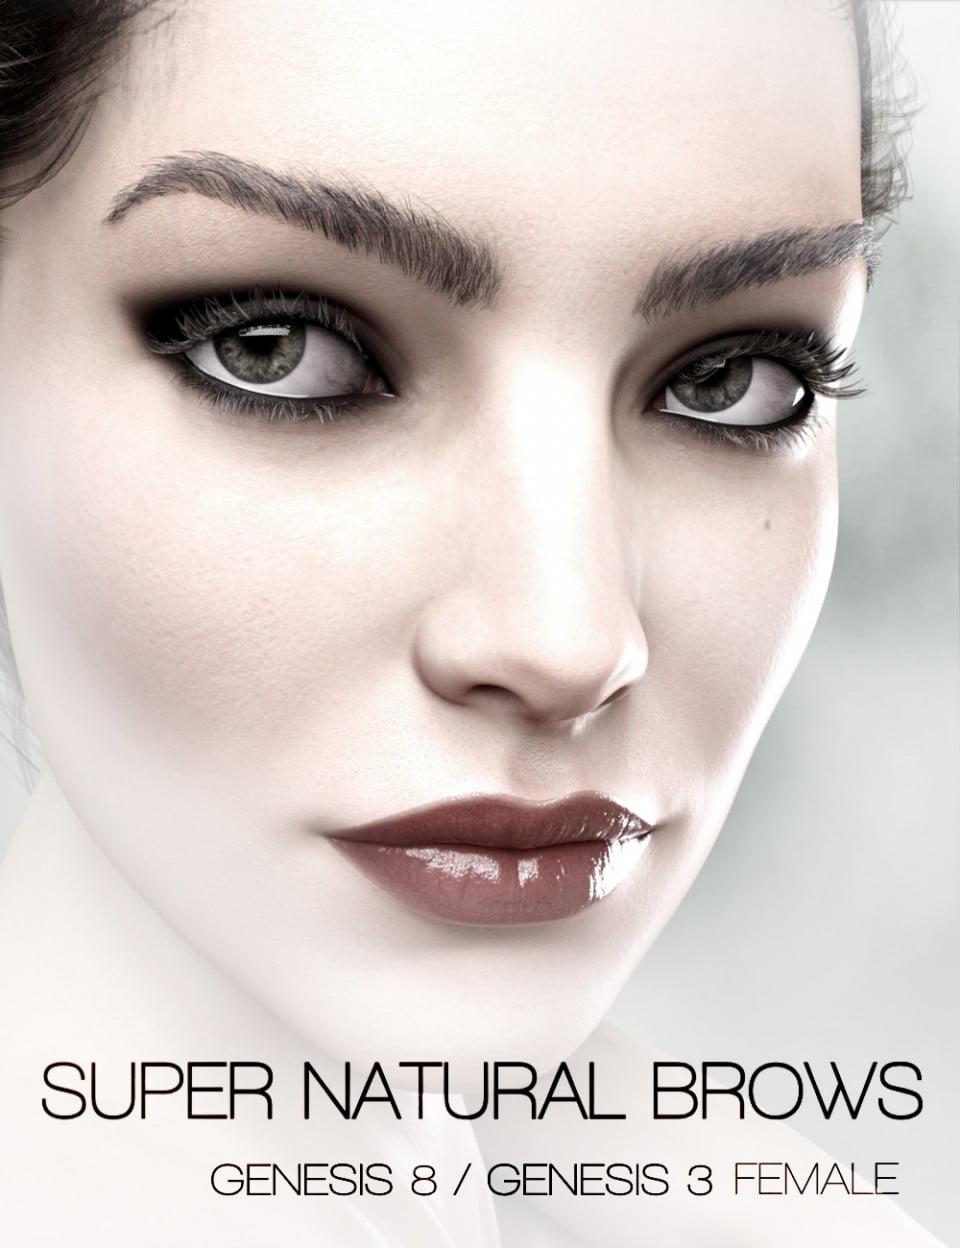 Super Natural Brows G8F/G3F